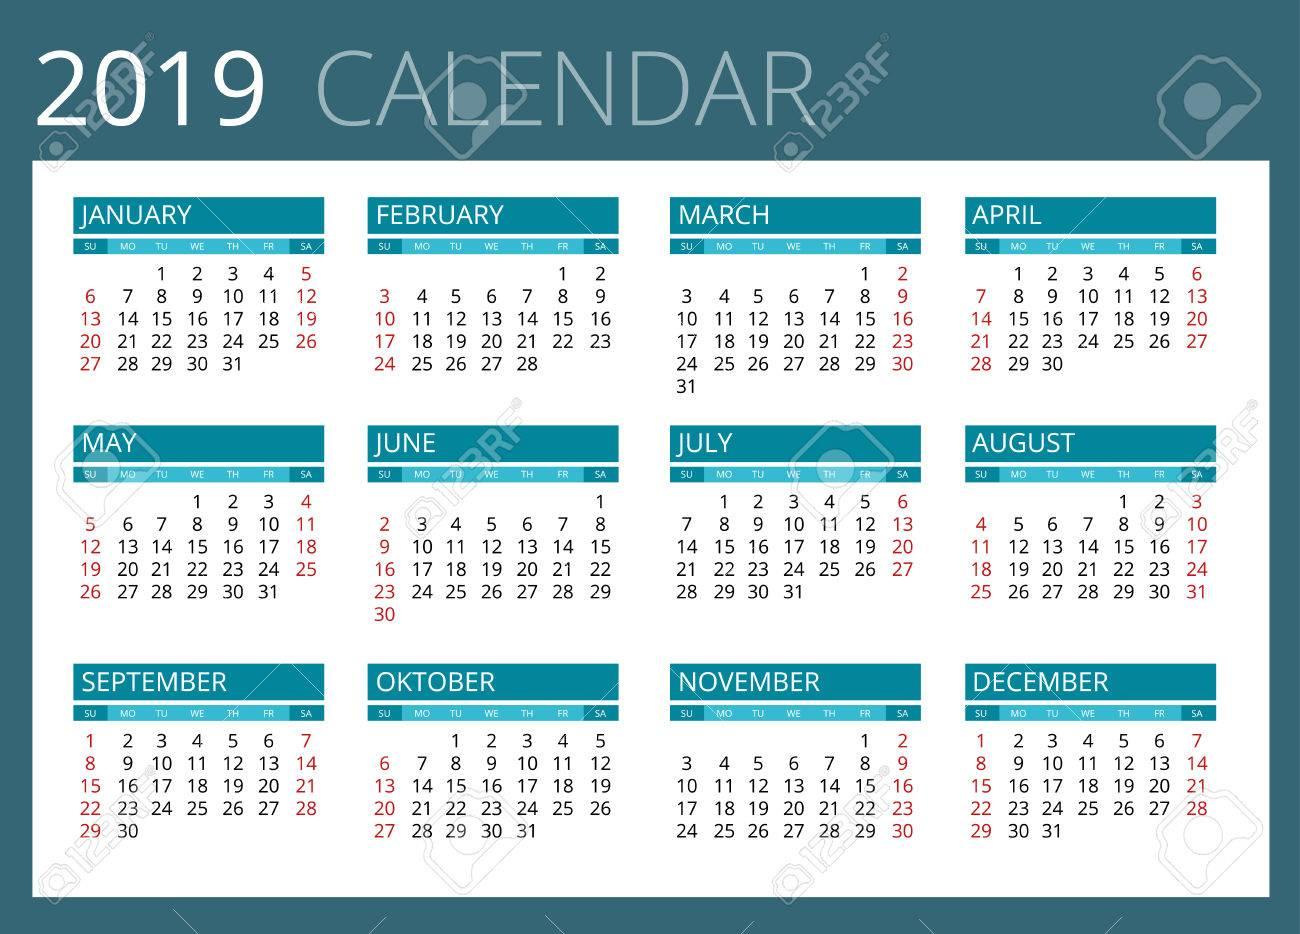 Calendario 2019 Week Number.Calendar For 2019 Week Starts Sunday Simple Vector Design